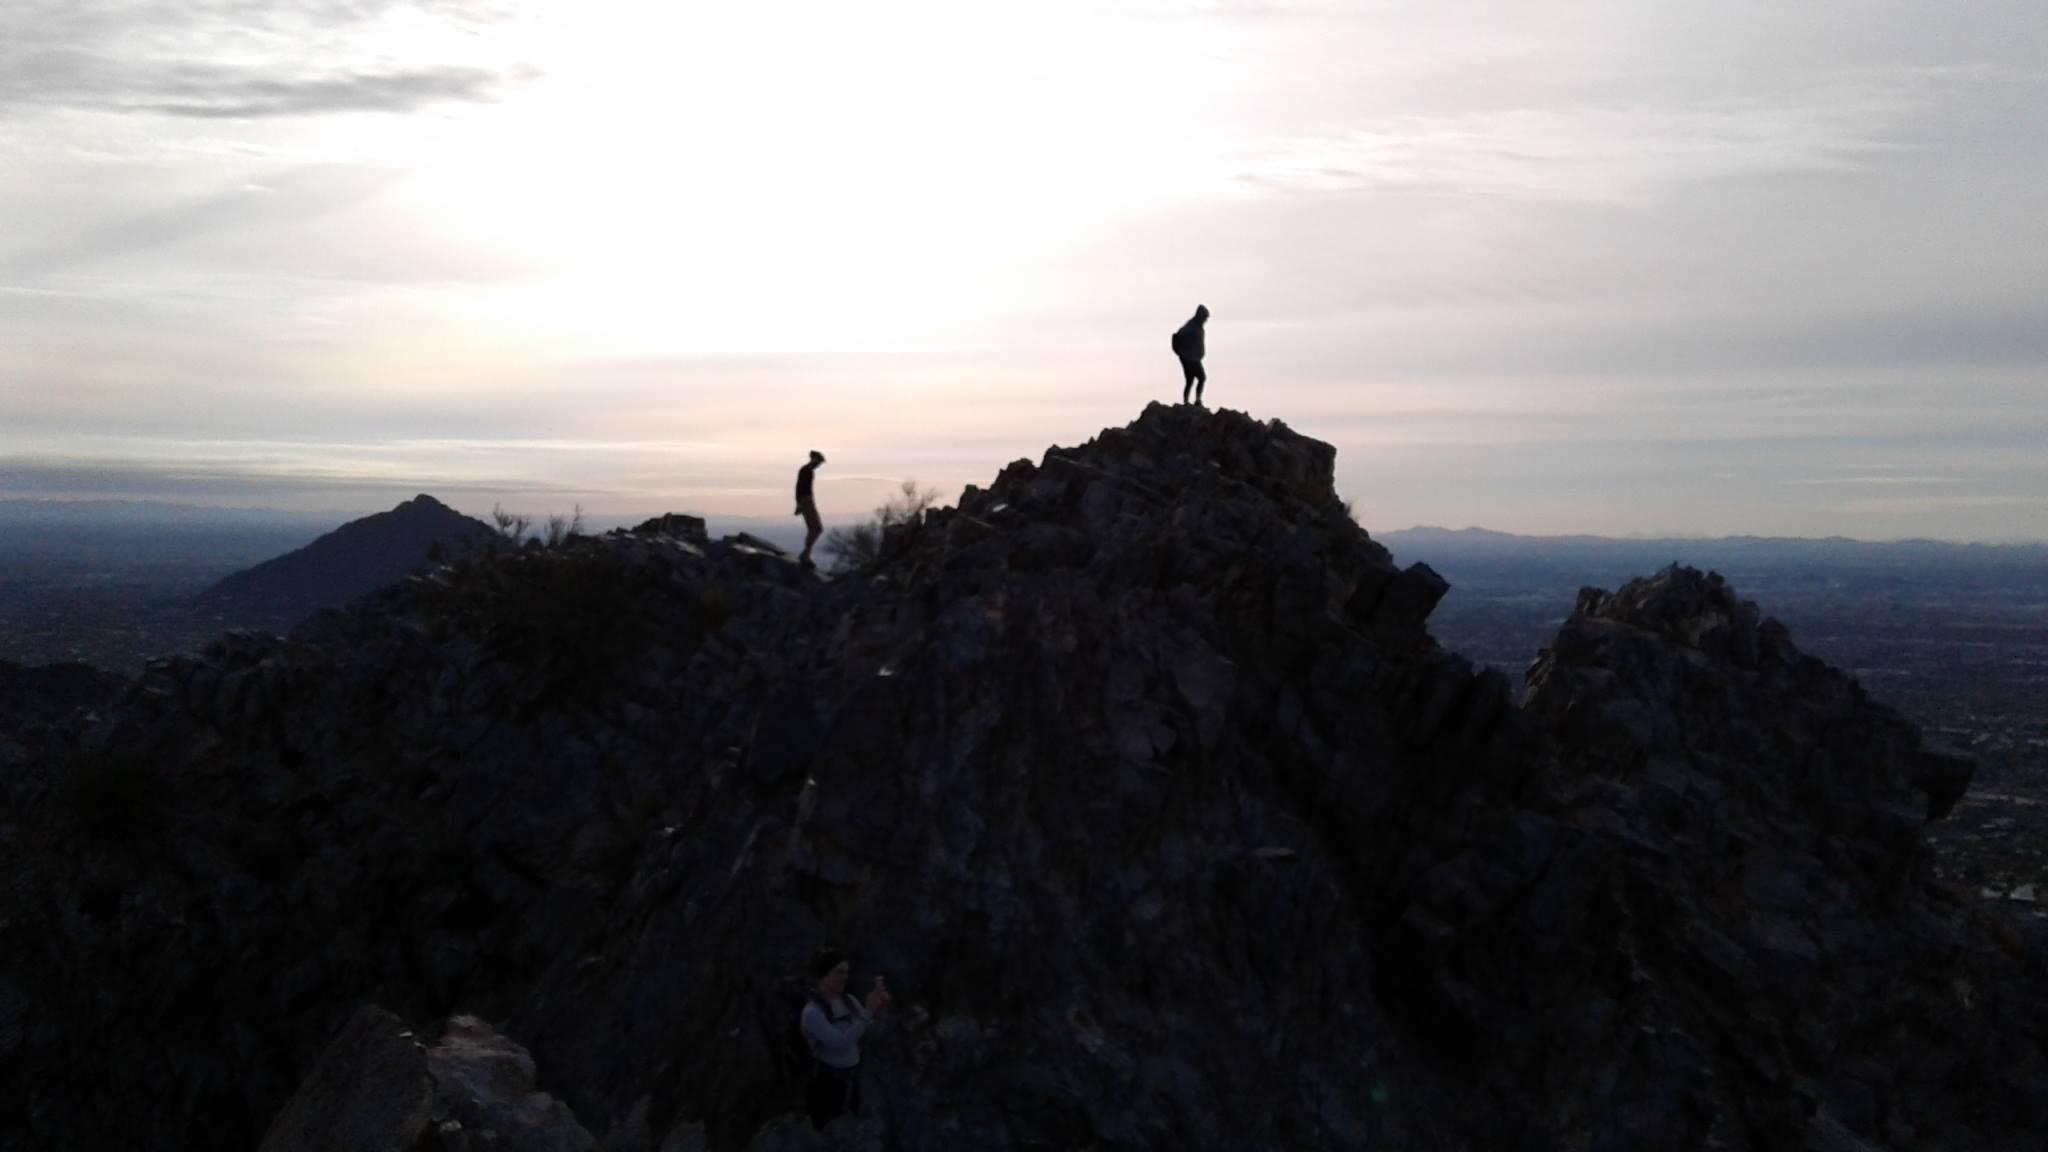 Silhouette of hikers on mountain peak